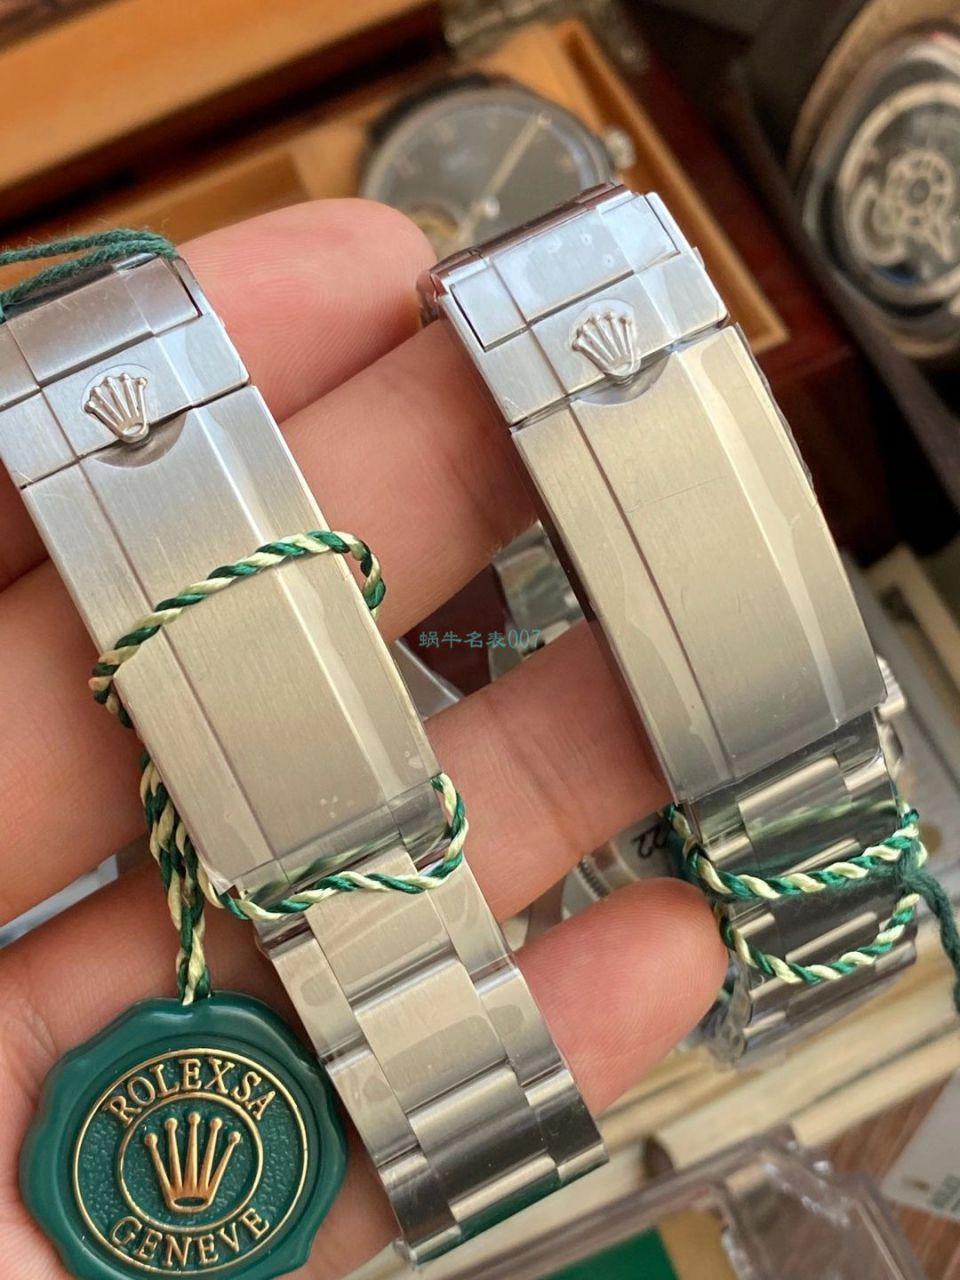 VS厂专柜新款41毫米劳力士绿水鬼一比一顶级复刻手表m126610lv-0002新款绿水鬼 / R698